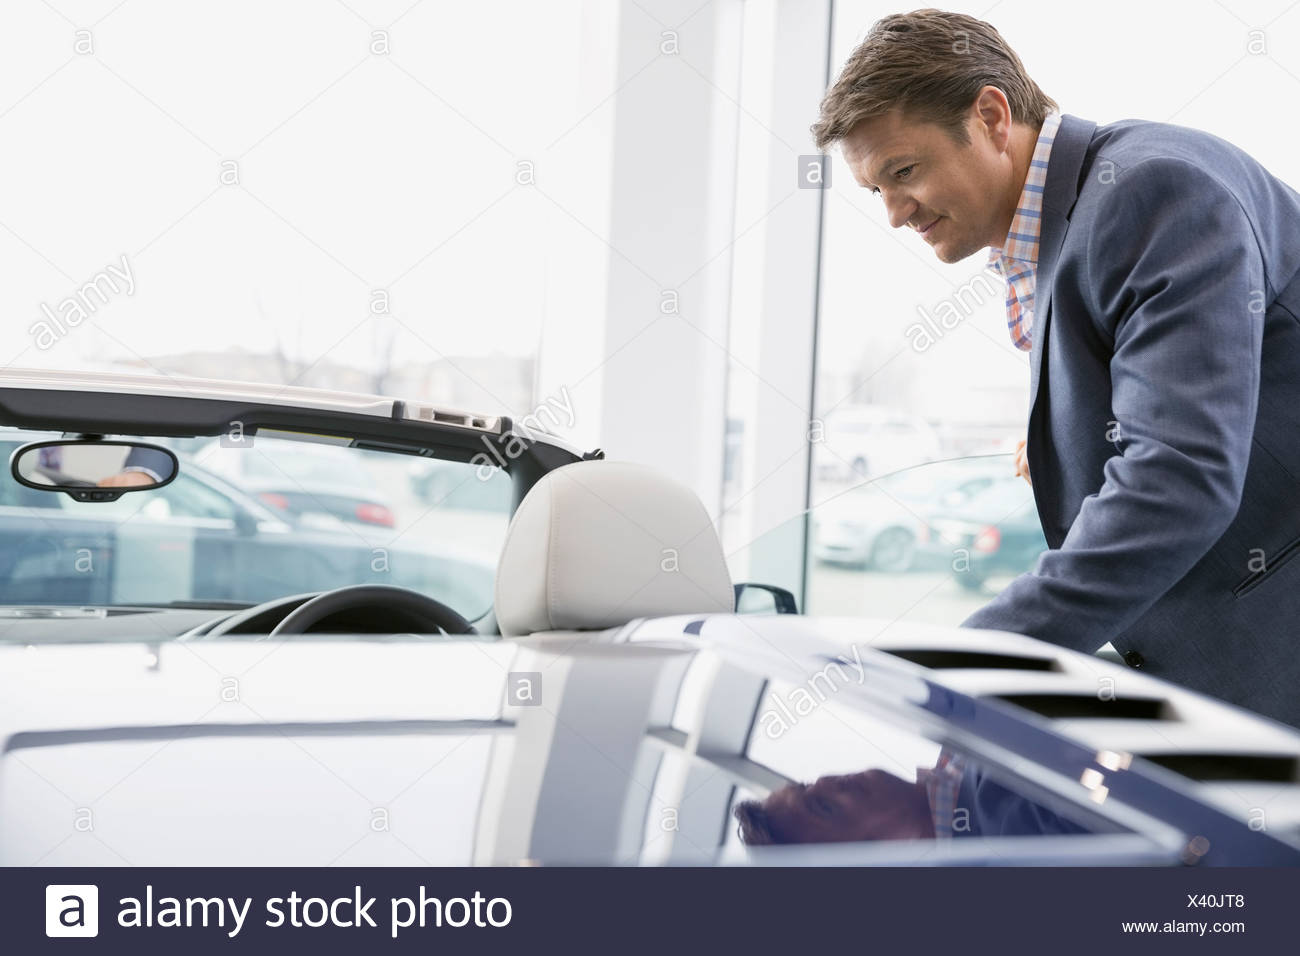 Man looking at convertible in car dealership showroom - Stock Image